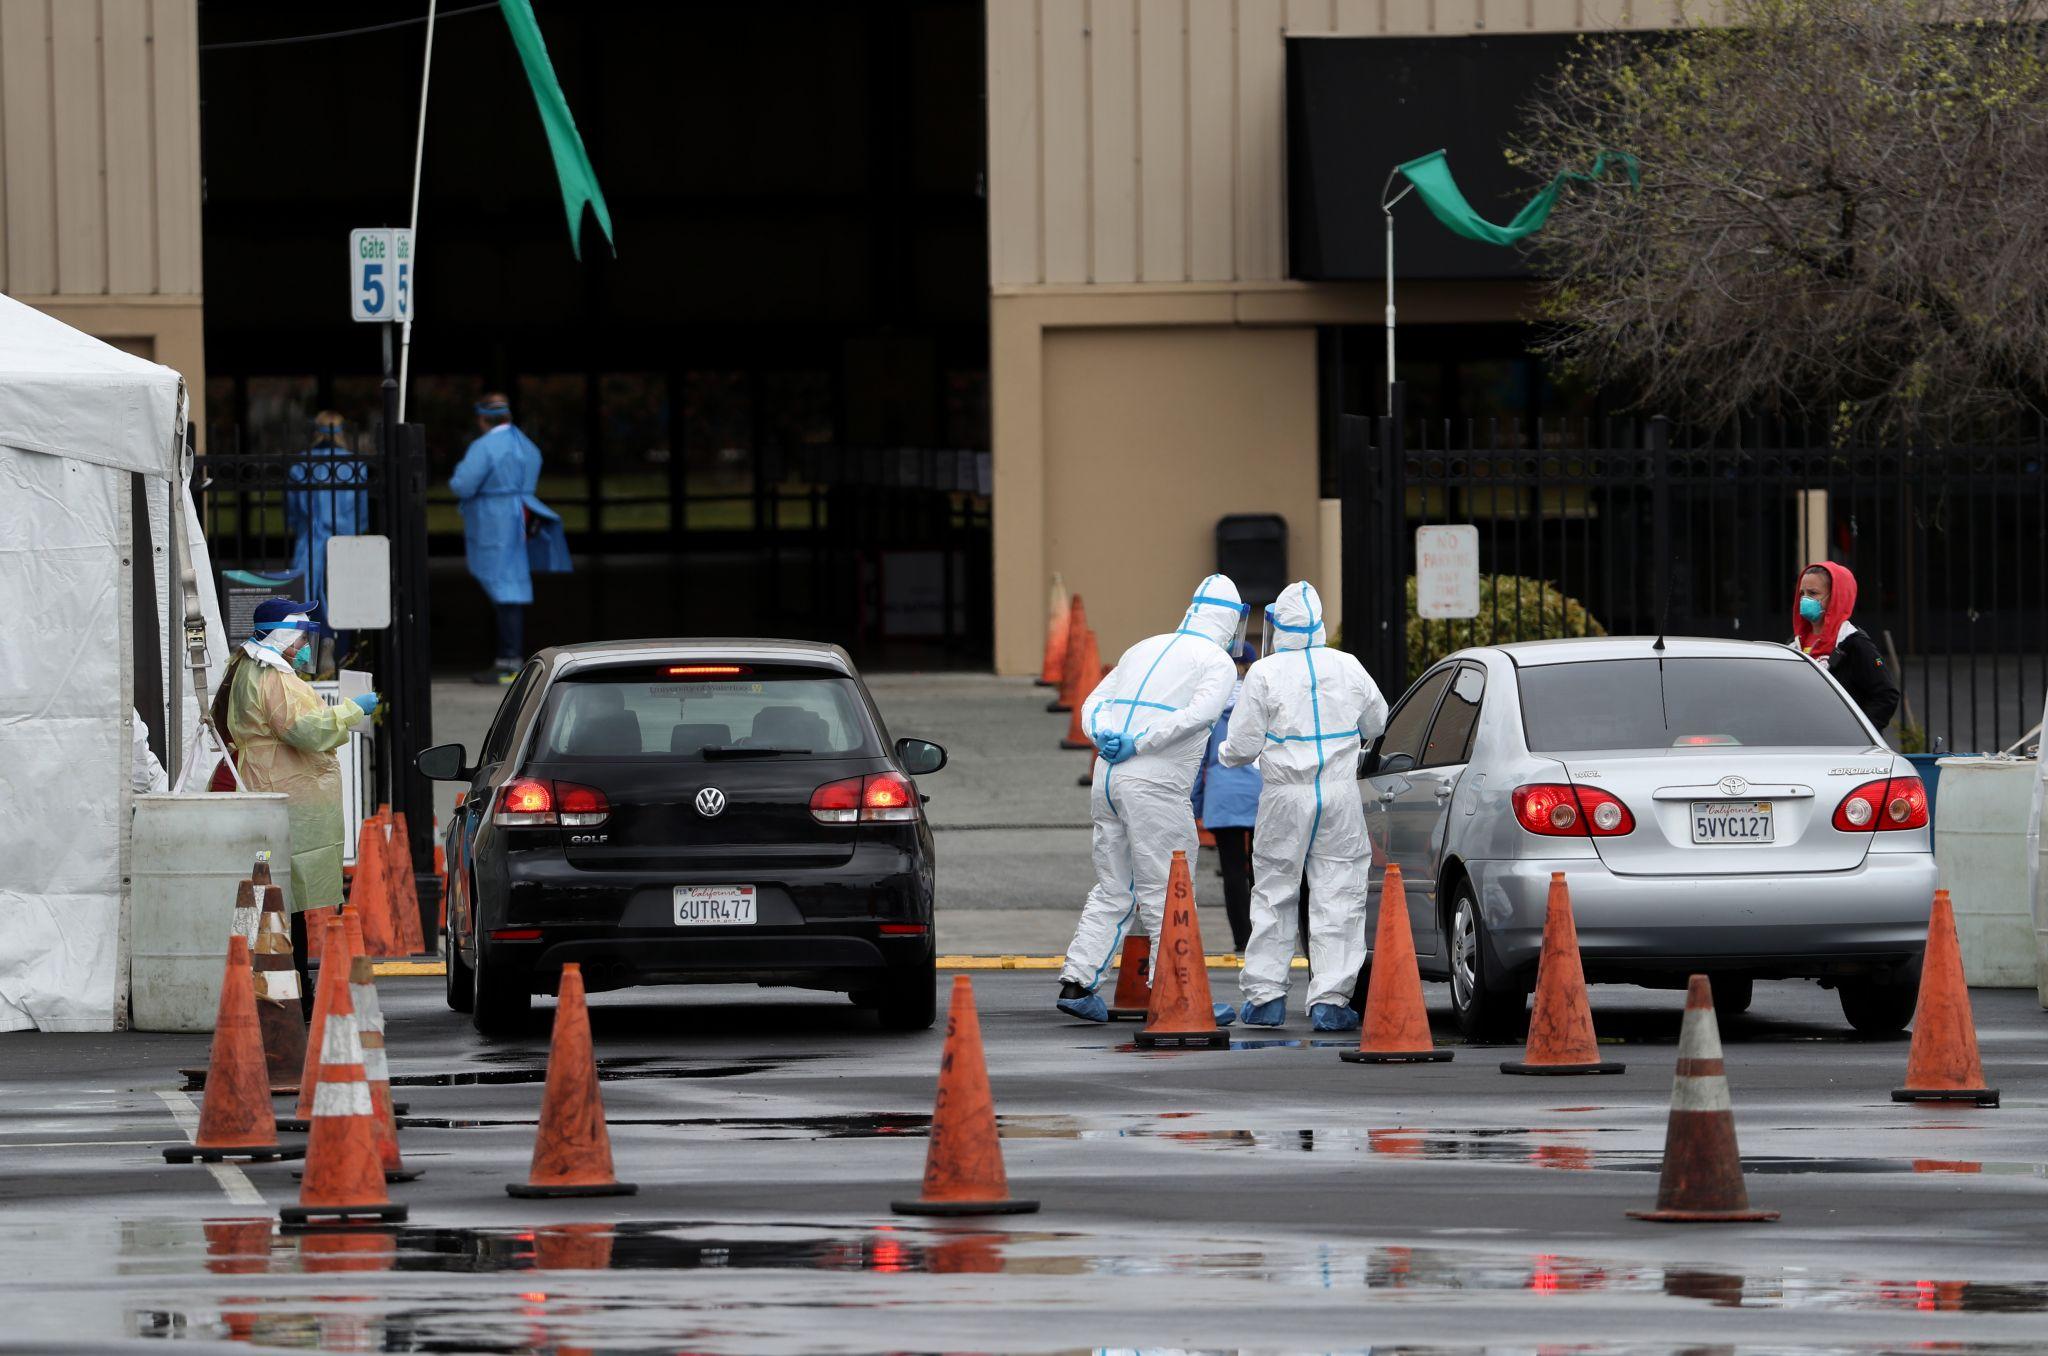 Coronavirus updates: San Mateo County must close more indoor businesses